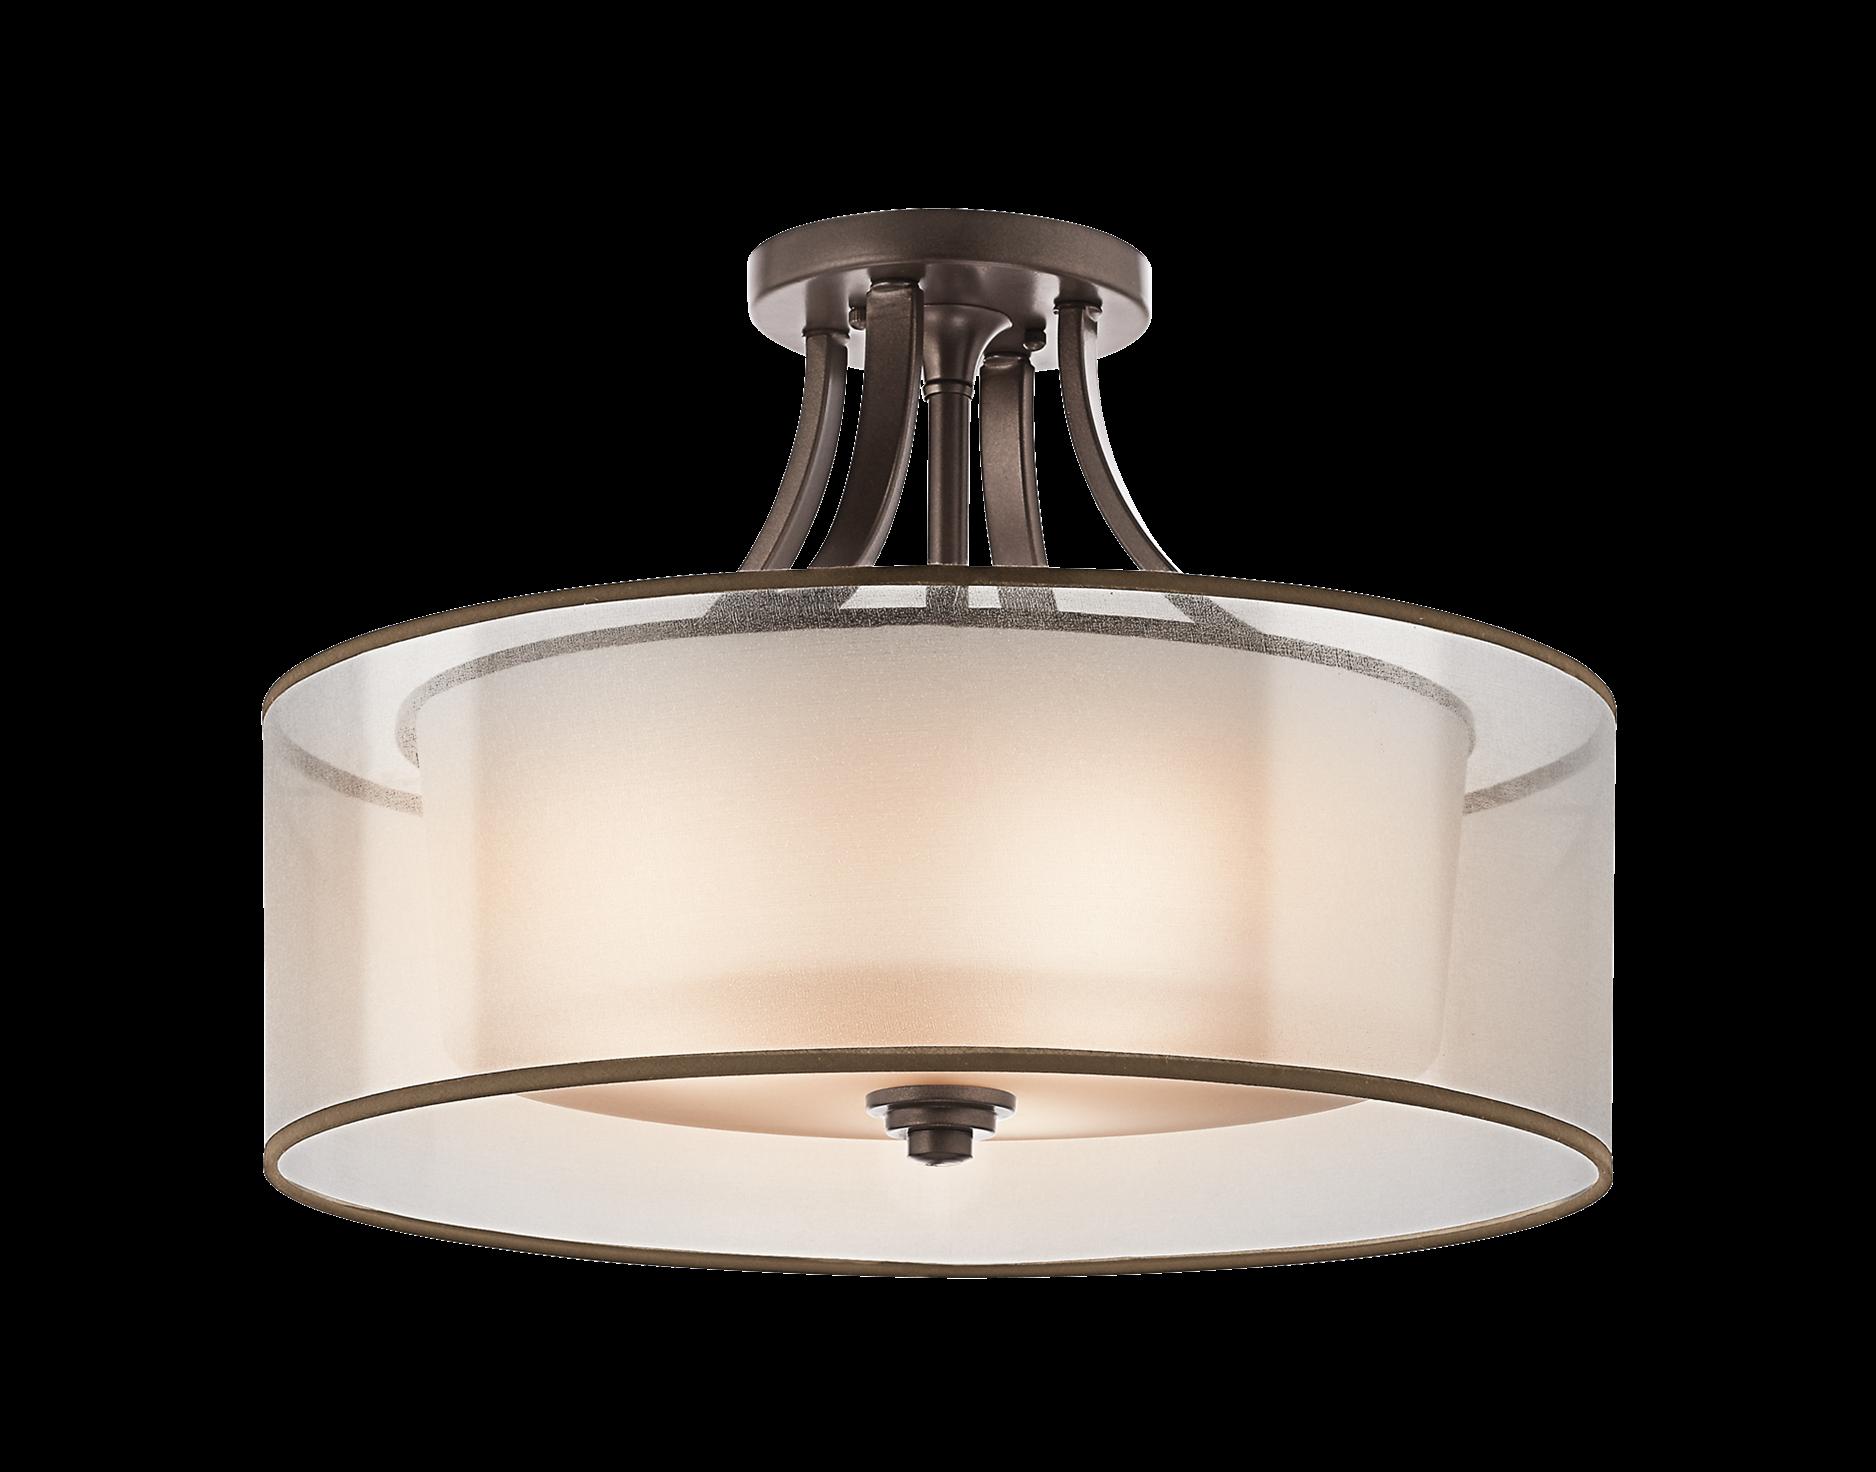 Lacey 4 Light Semi Flush Ceiling Light.